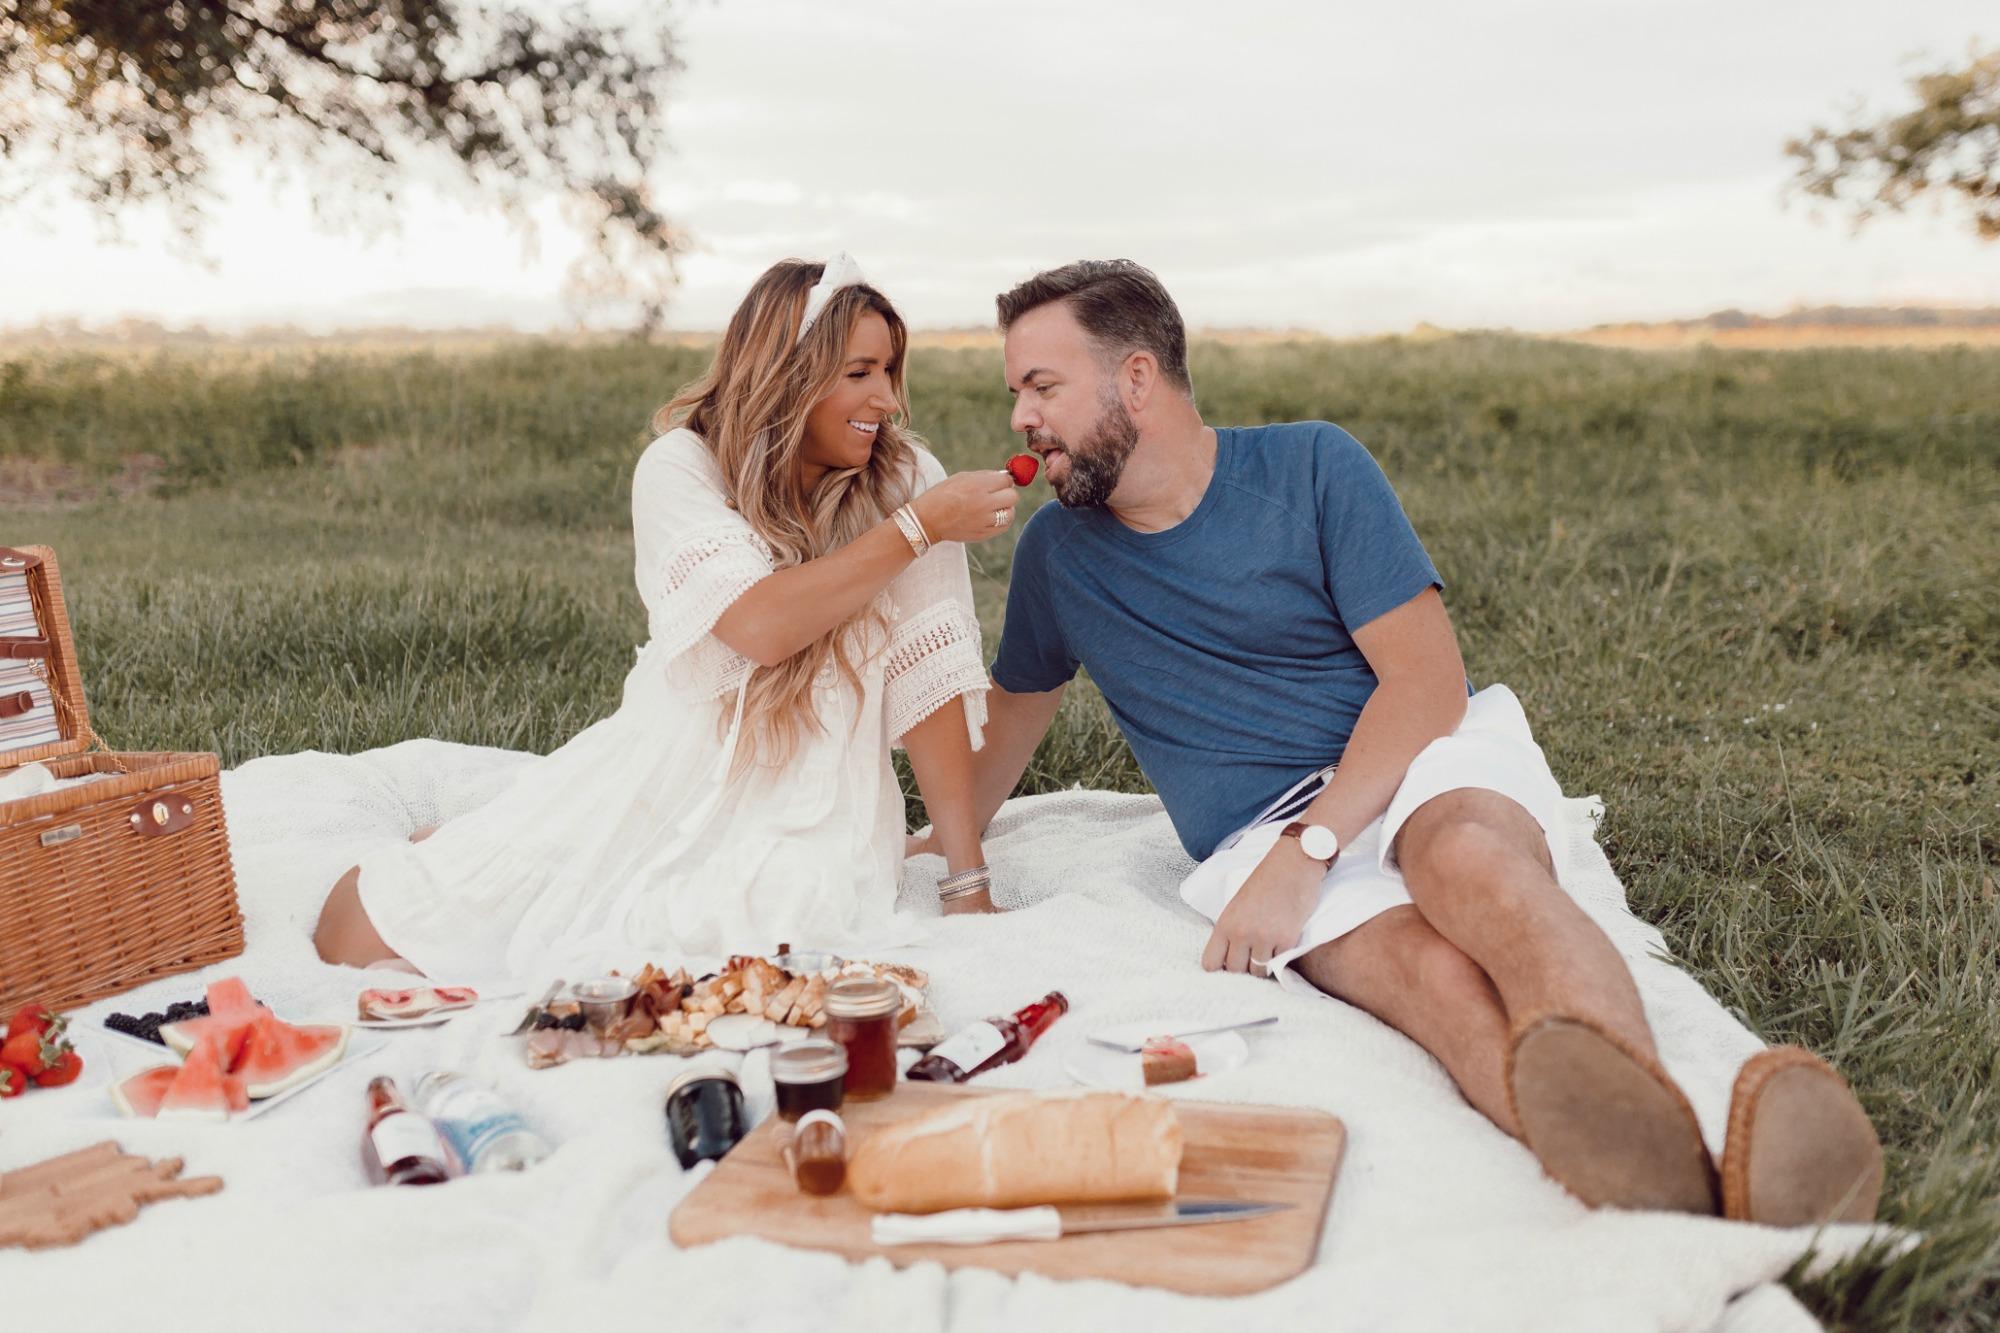 Romantic picnic Ideas on JanuaryHart.com